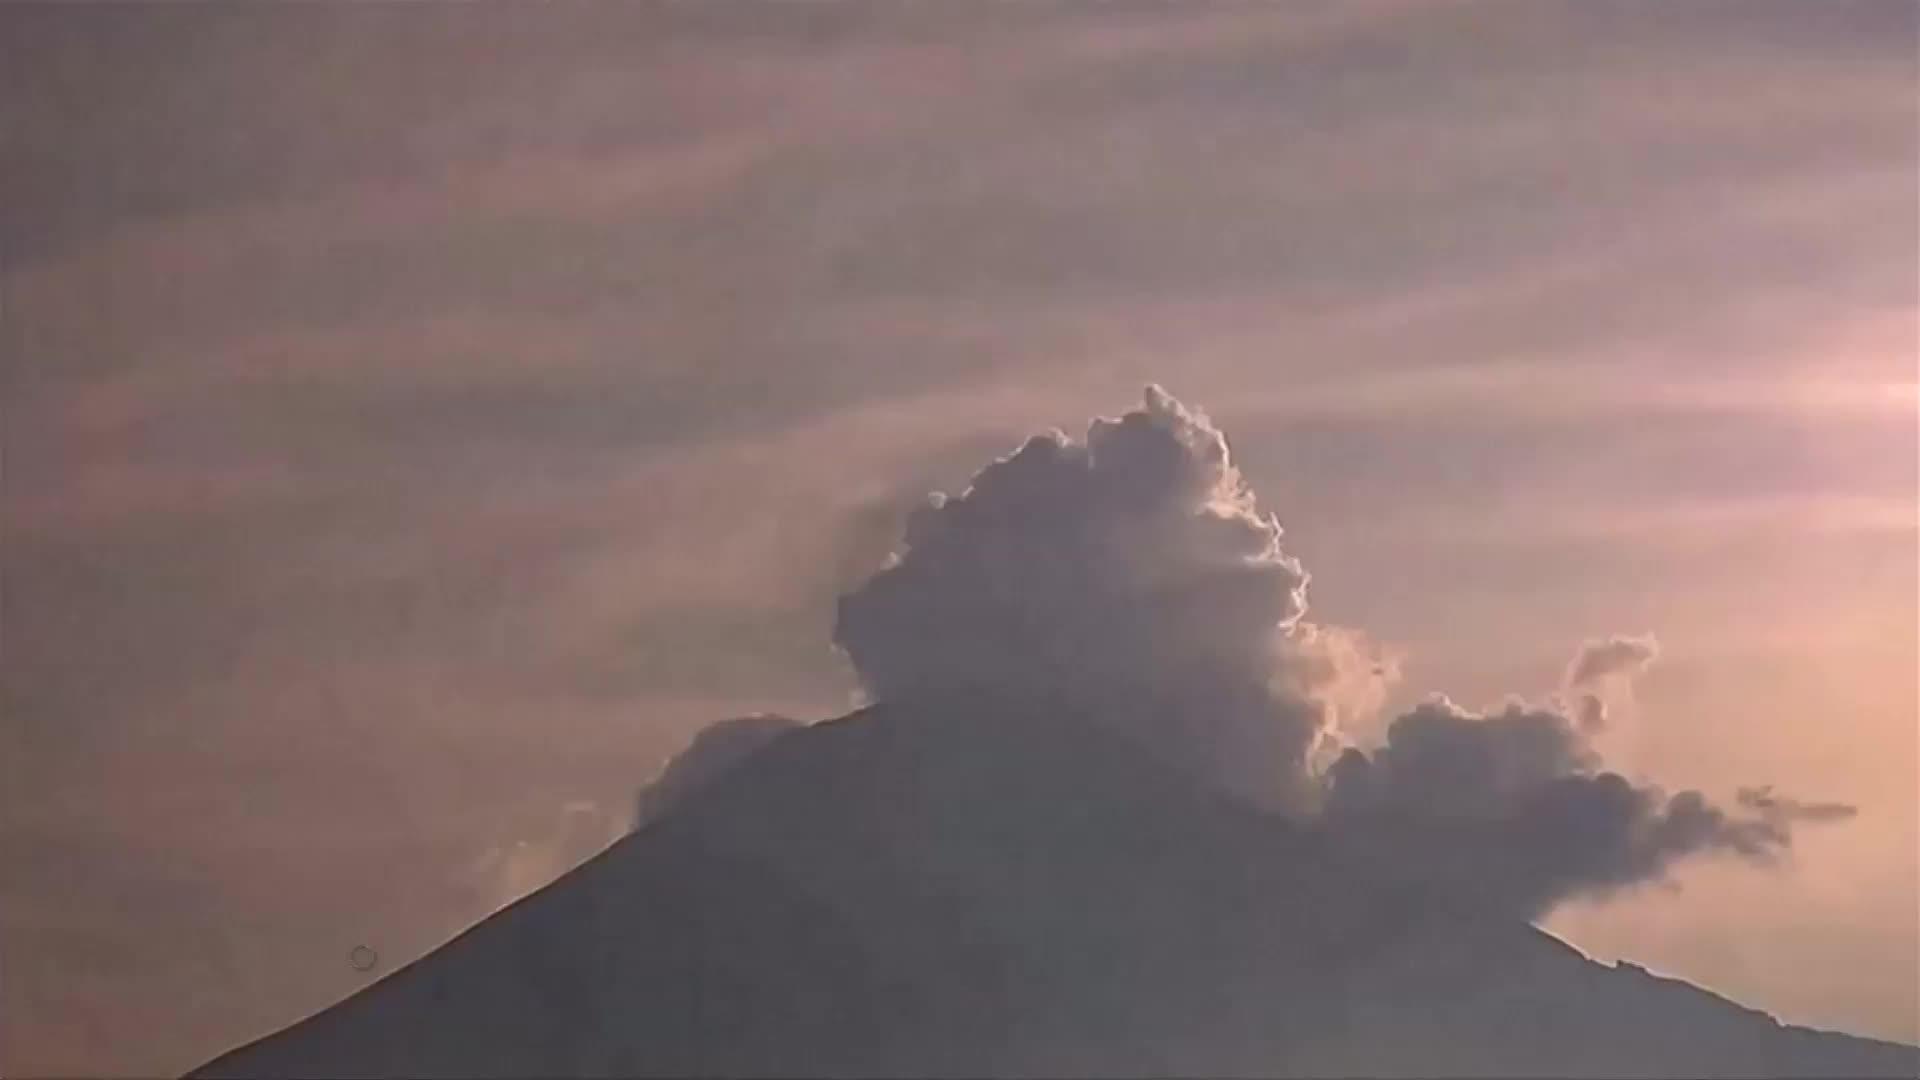 Video: Mexico's Popocatepetl blows its top